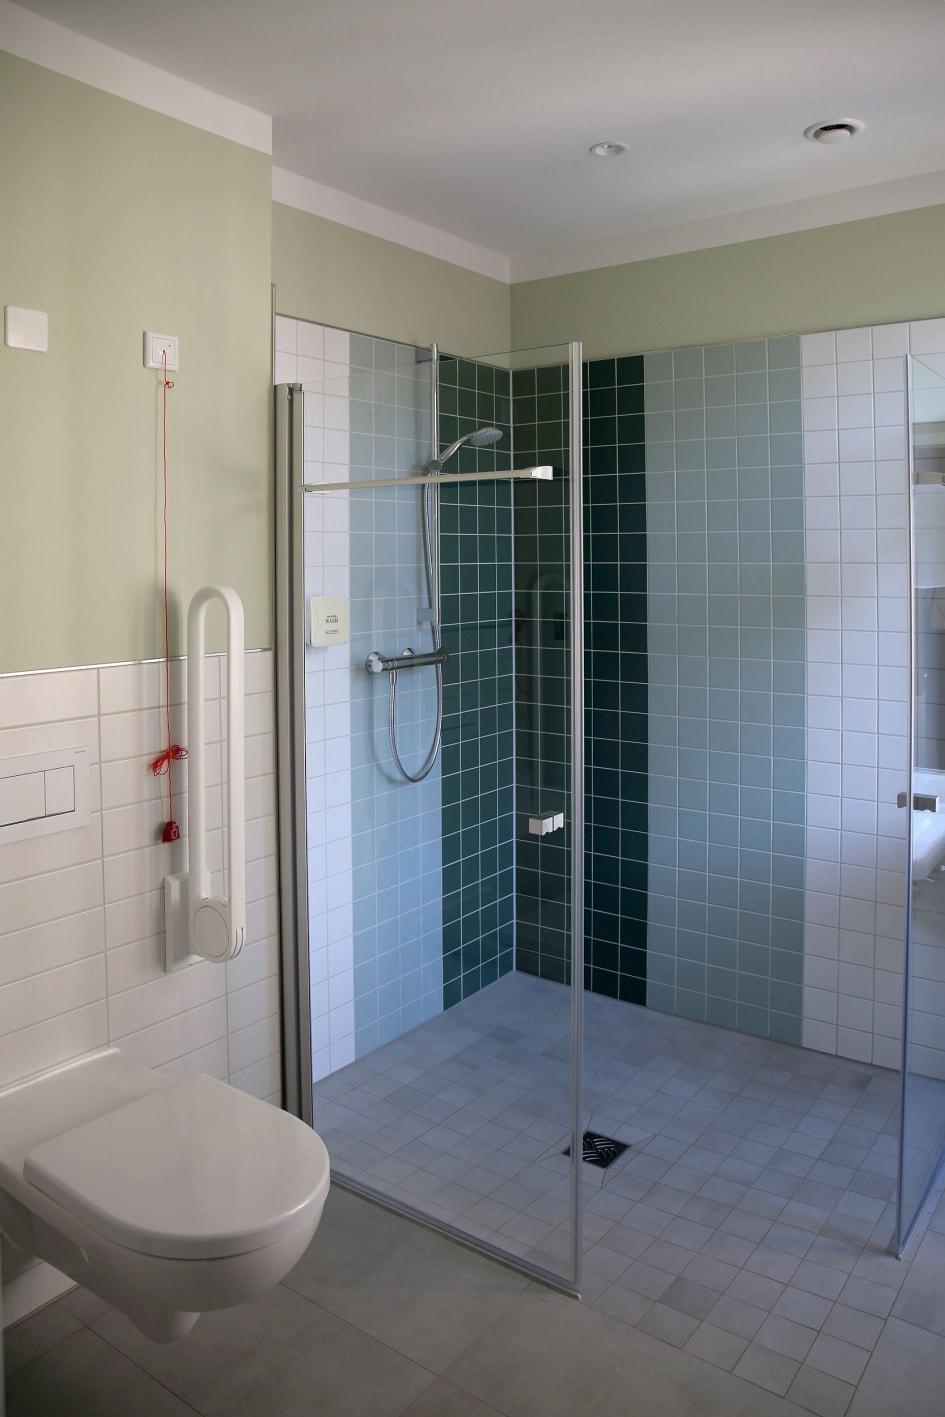 Integrationshotel Philippus Behindertengerechtes Badezimmer - Behindertengerechtes badezimmer